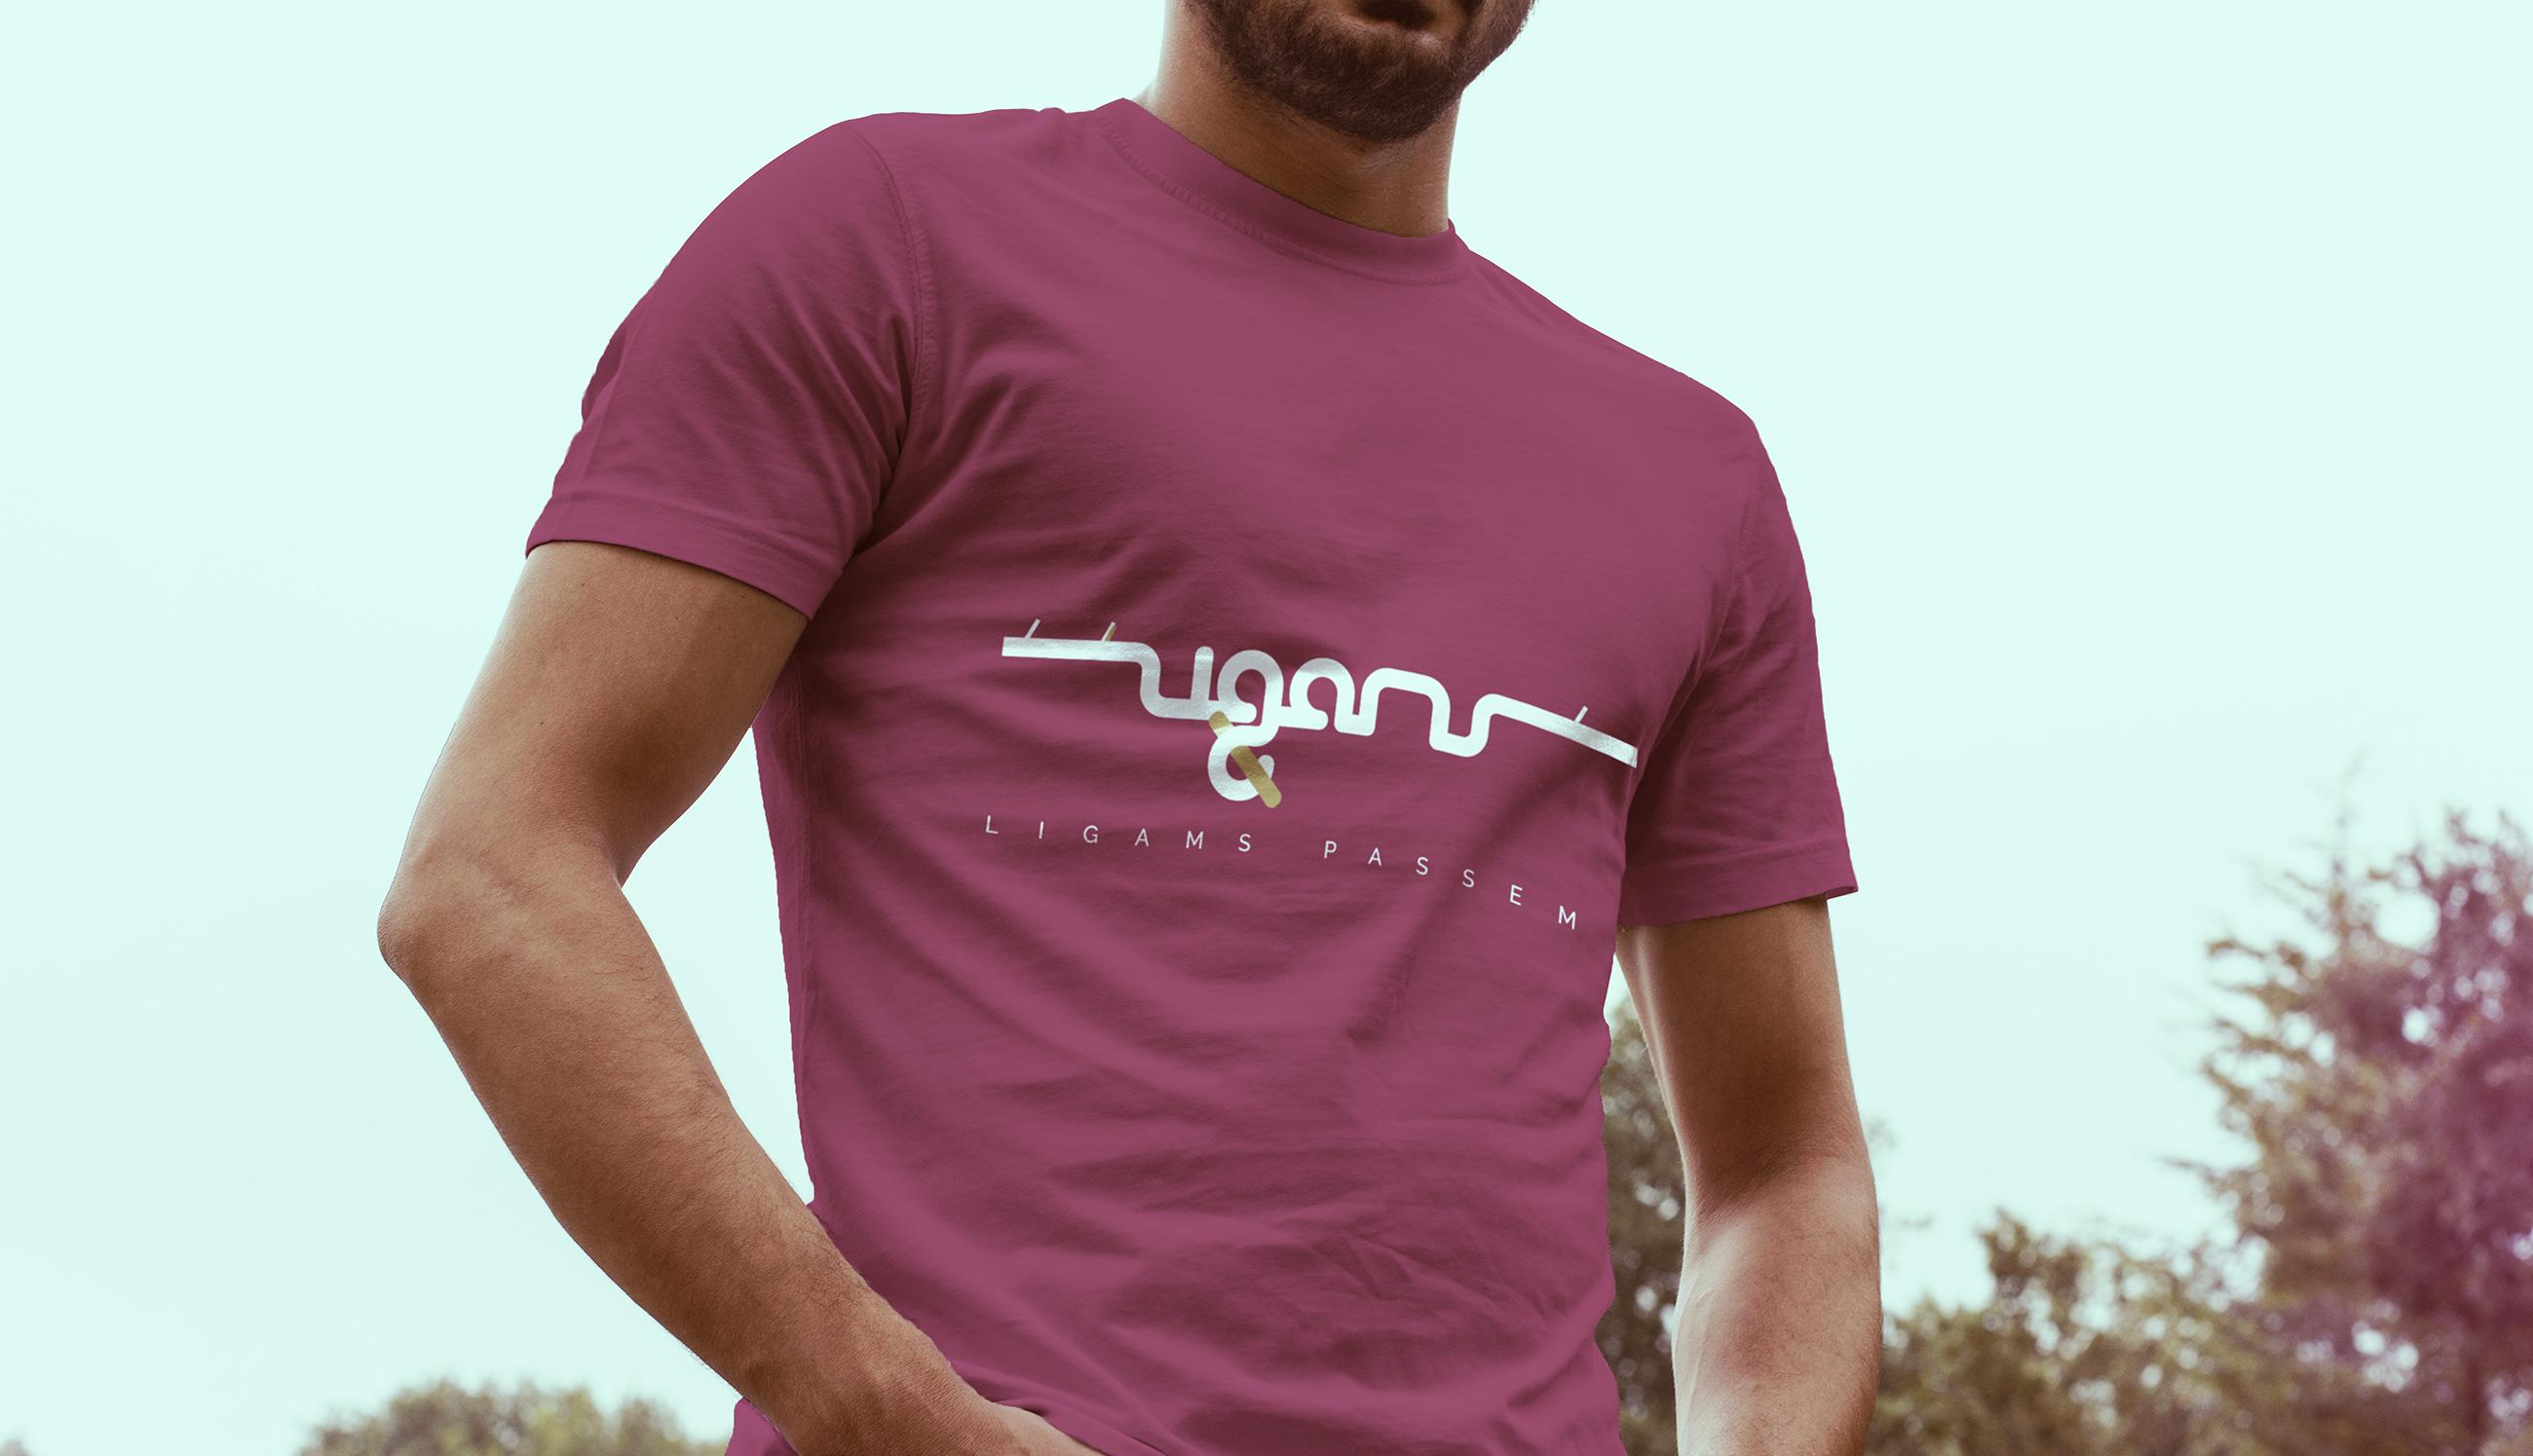 logo-ligams-passem-18-2600×1495